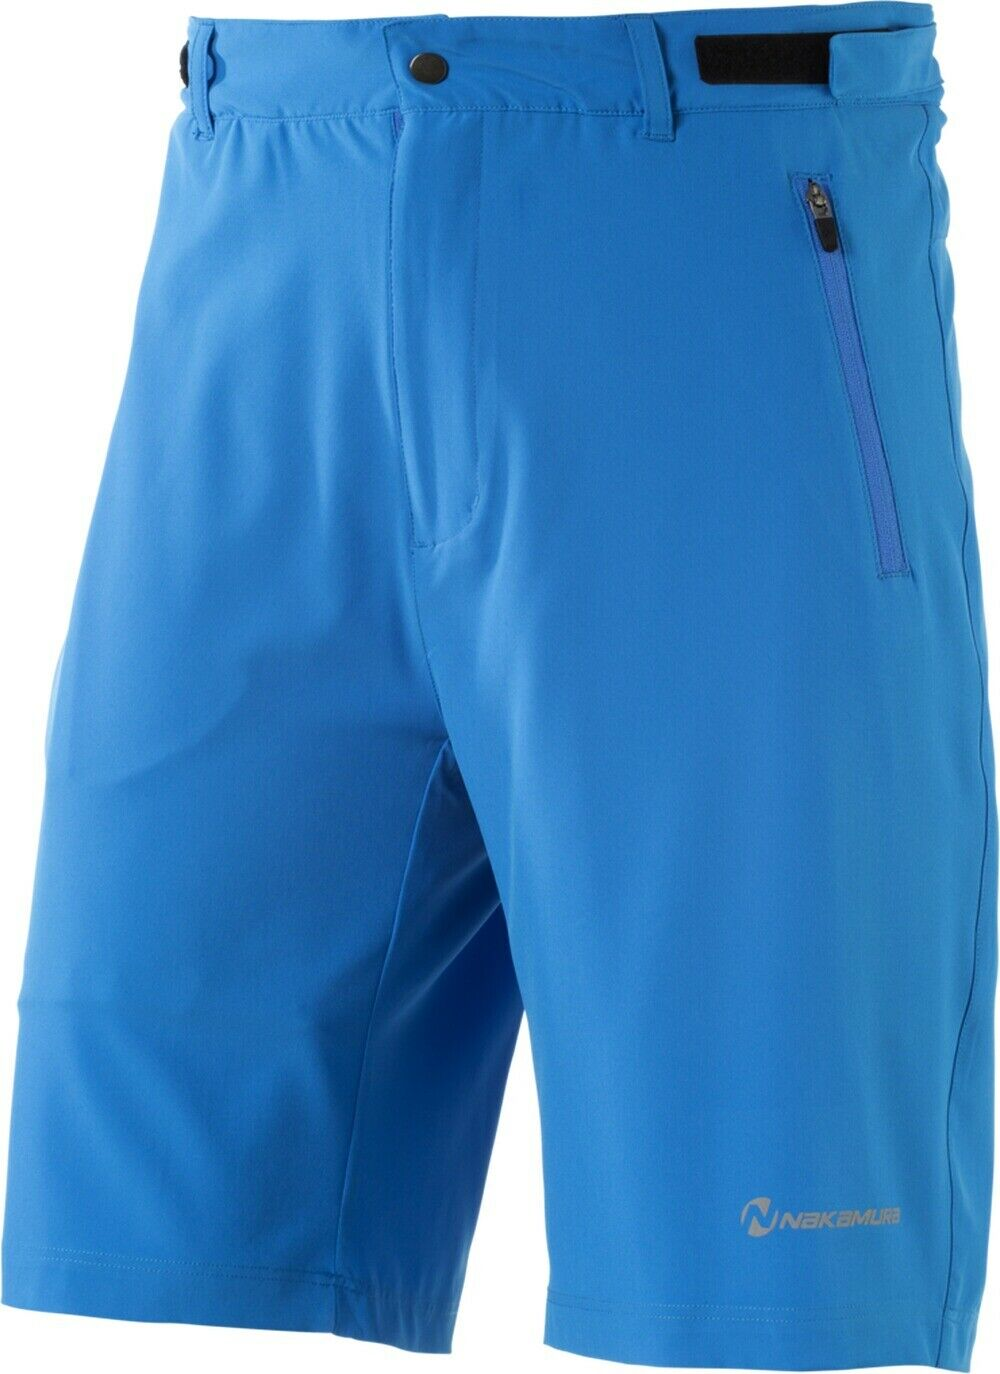 Nakamura cycling pants men  mountain bike 2 in 1 radshorts  brand outlet